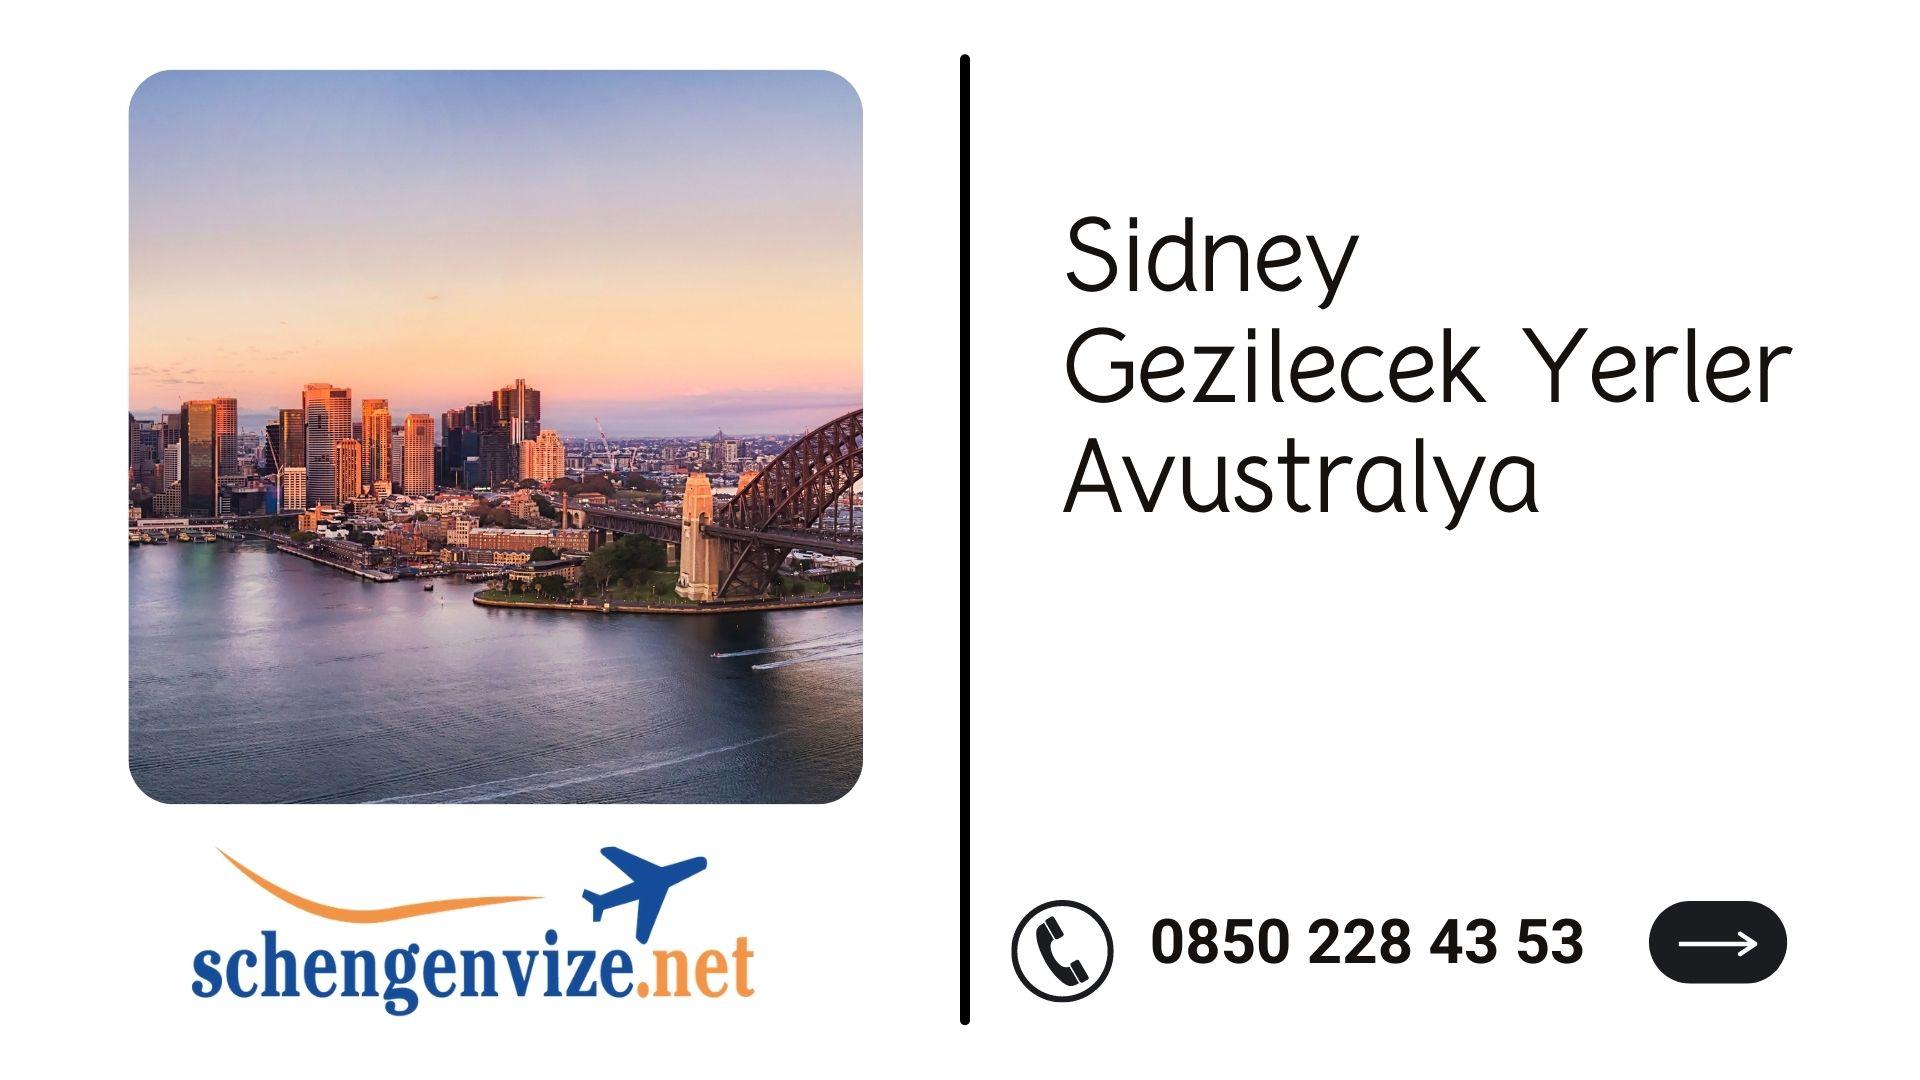 Sidney Gezilecek Yerler Avustralya